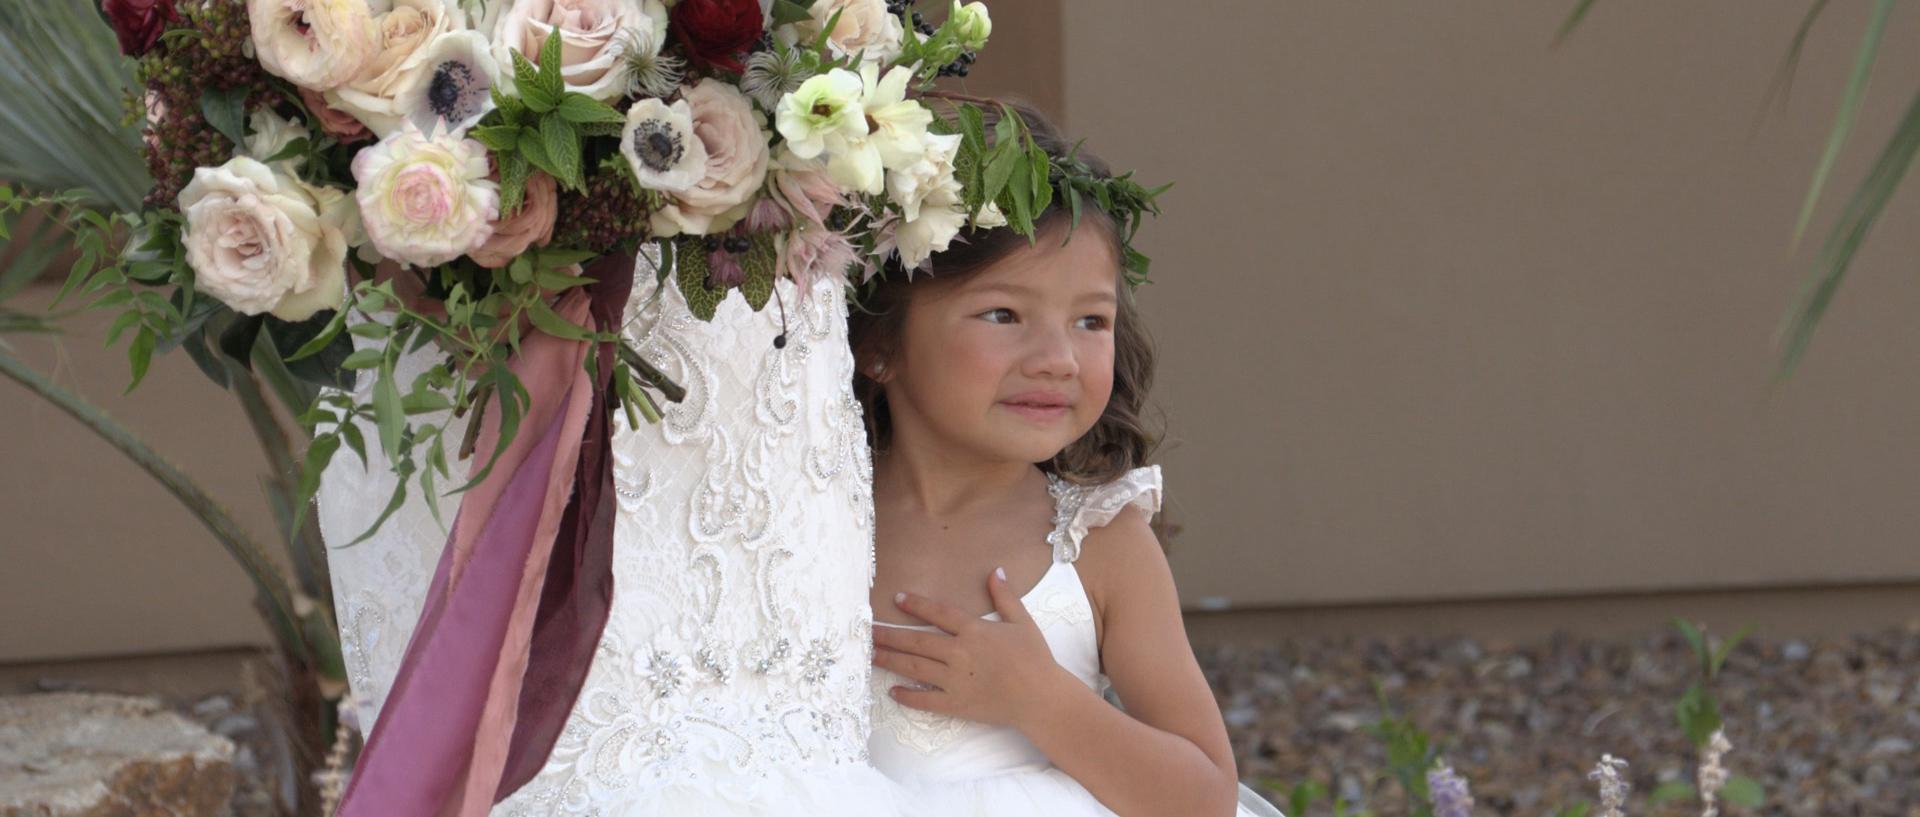 Jessica and Jeffrey Wedding Story.06_38_22_21.Still028.jpg